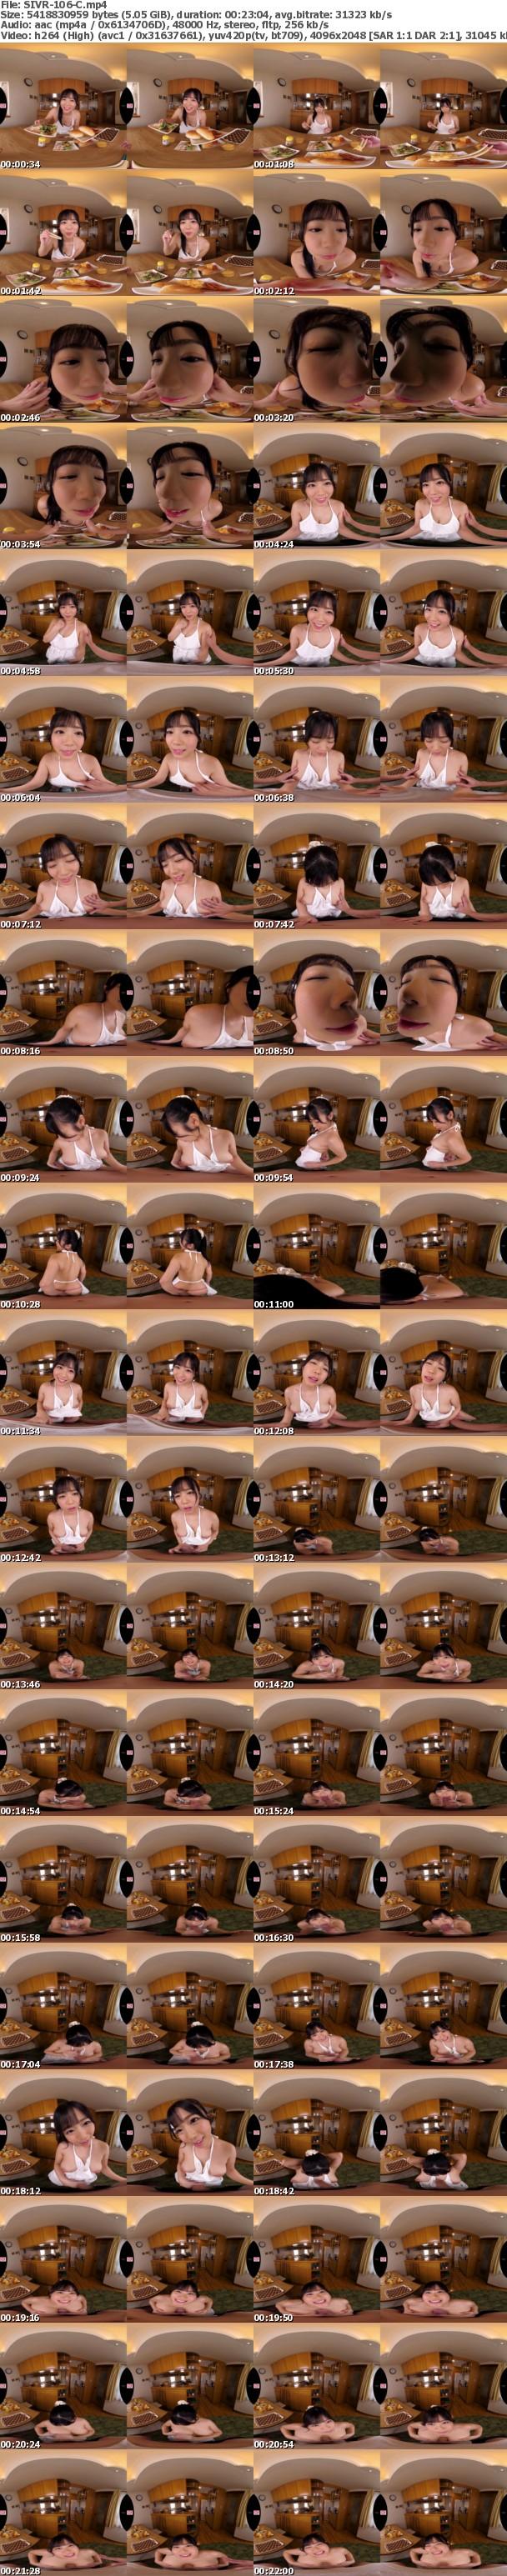 (VR) SIVR-106 羽咲みはるを完全独占!人気AV女優が僕だけに見せる素顔&イキ顔 最高の密着距離でひたすらSEXに没頭する究極同棲VR